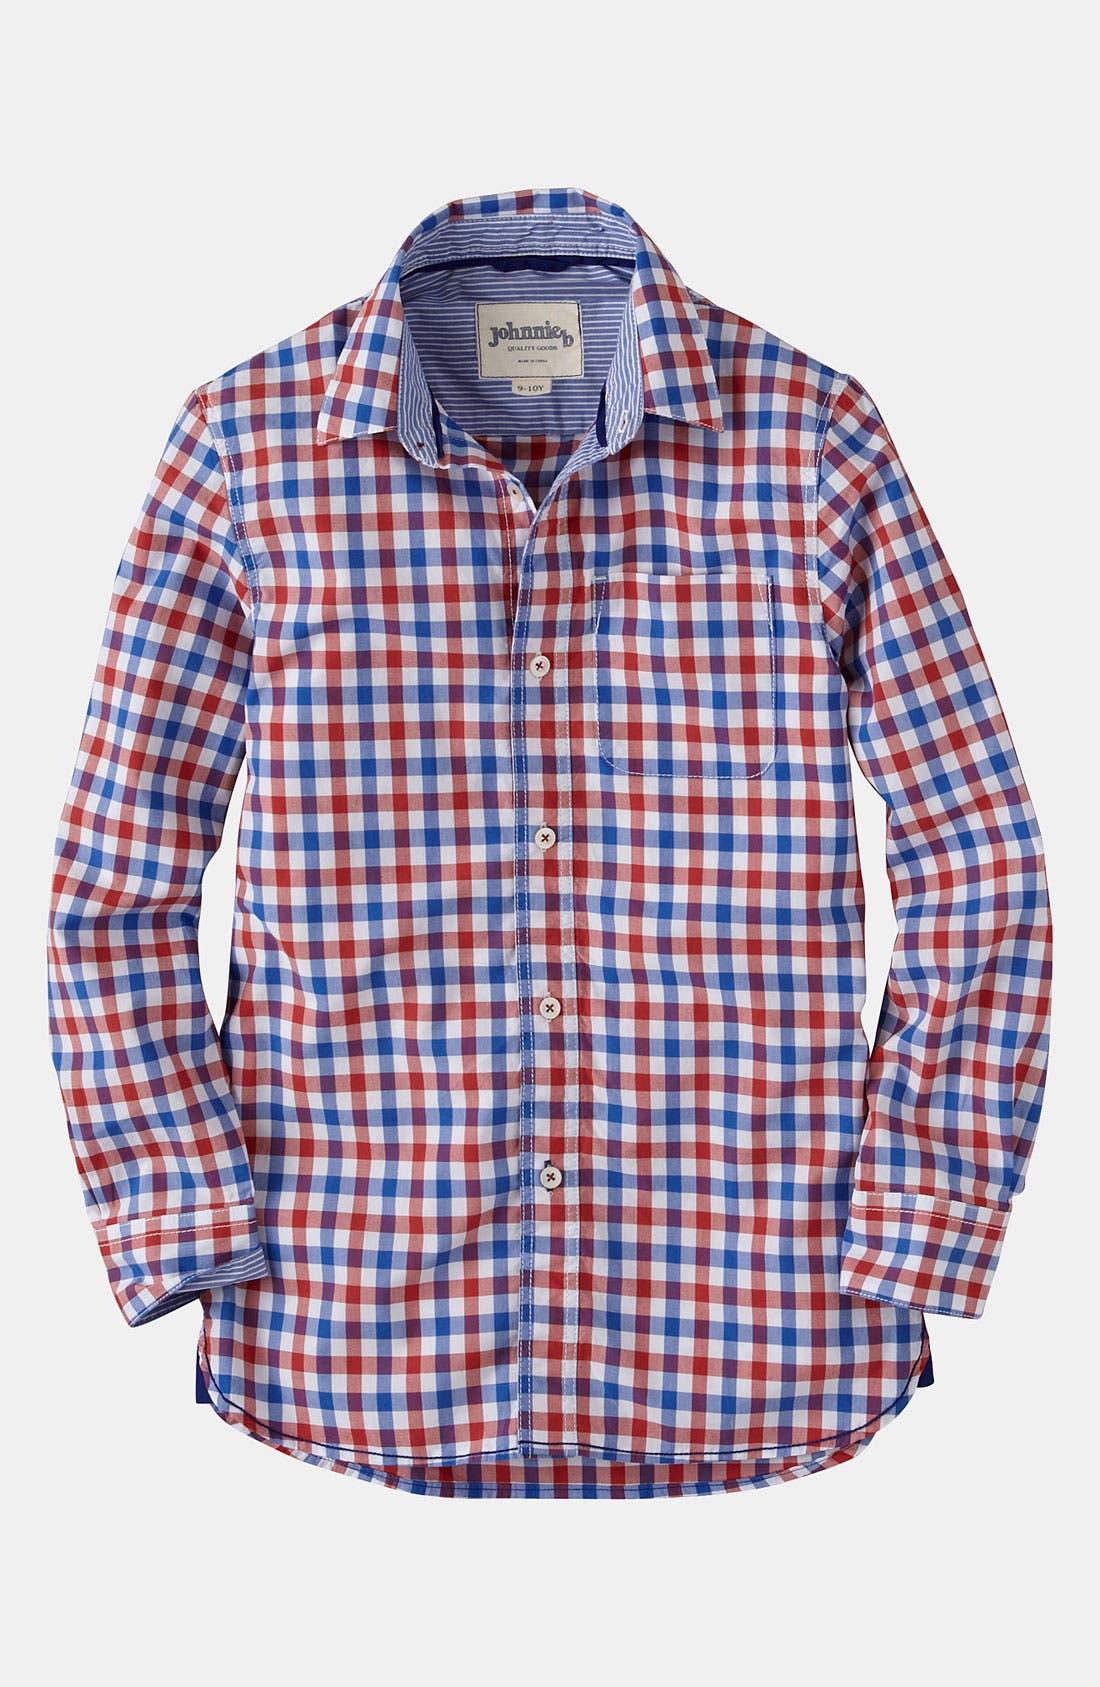 Alternate Image 1 Selected - Johnnie b Woven Shirt (Big Boys)